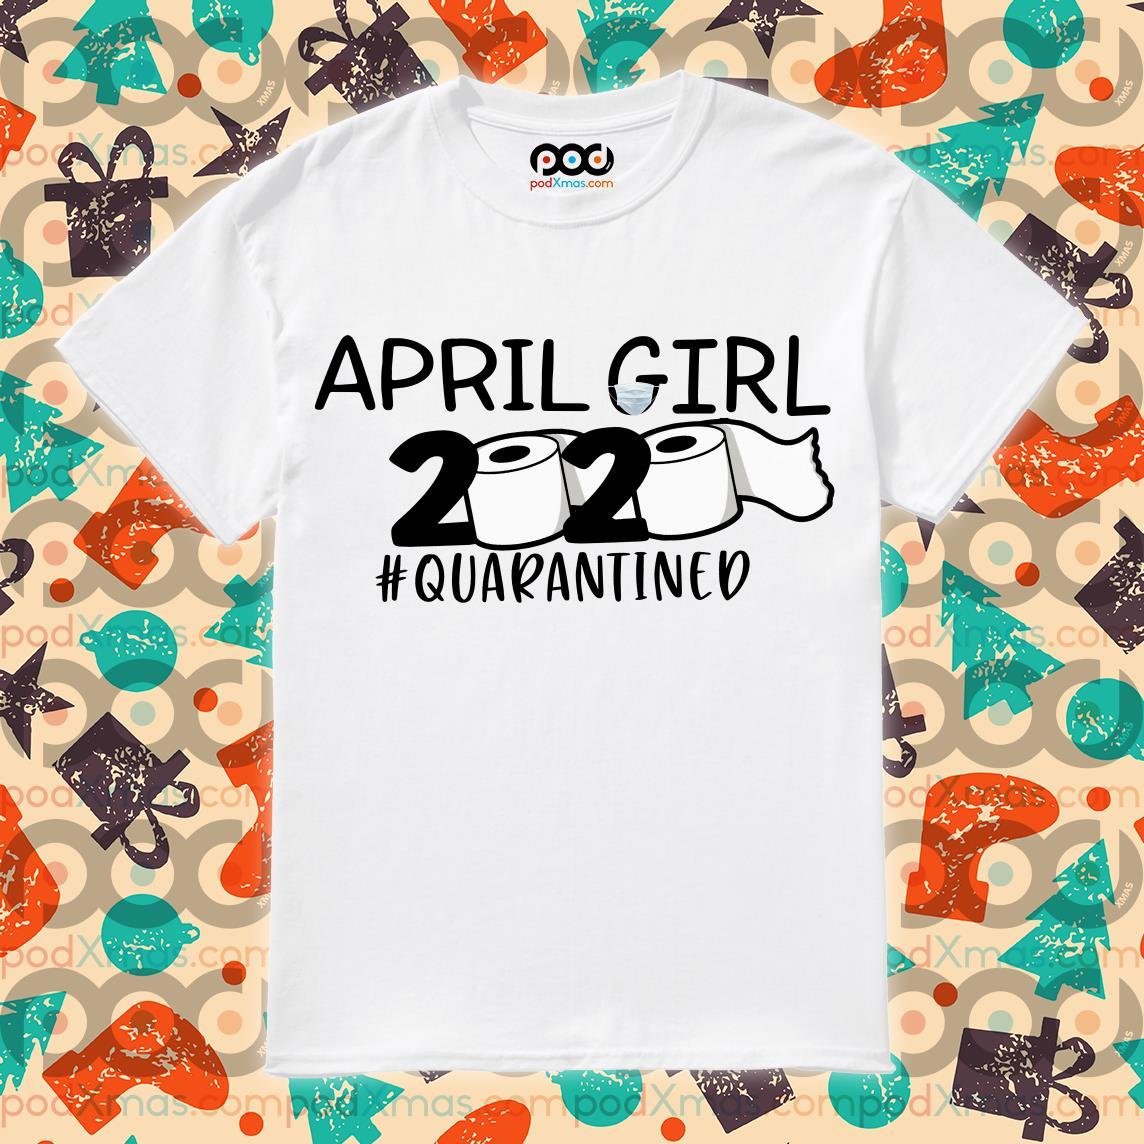 April girl 2020 quarantined T-shirt